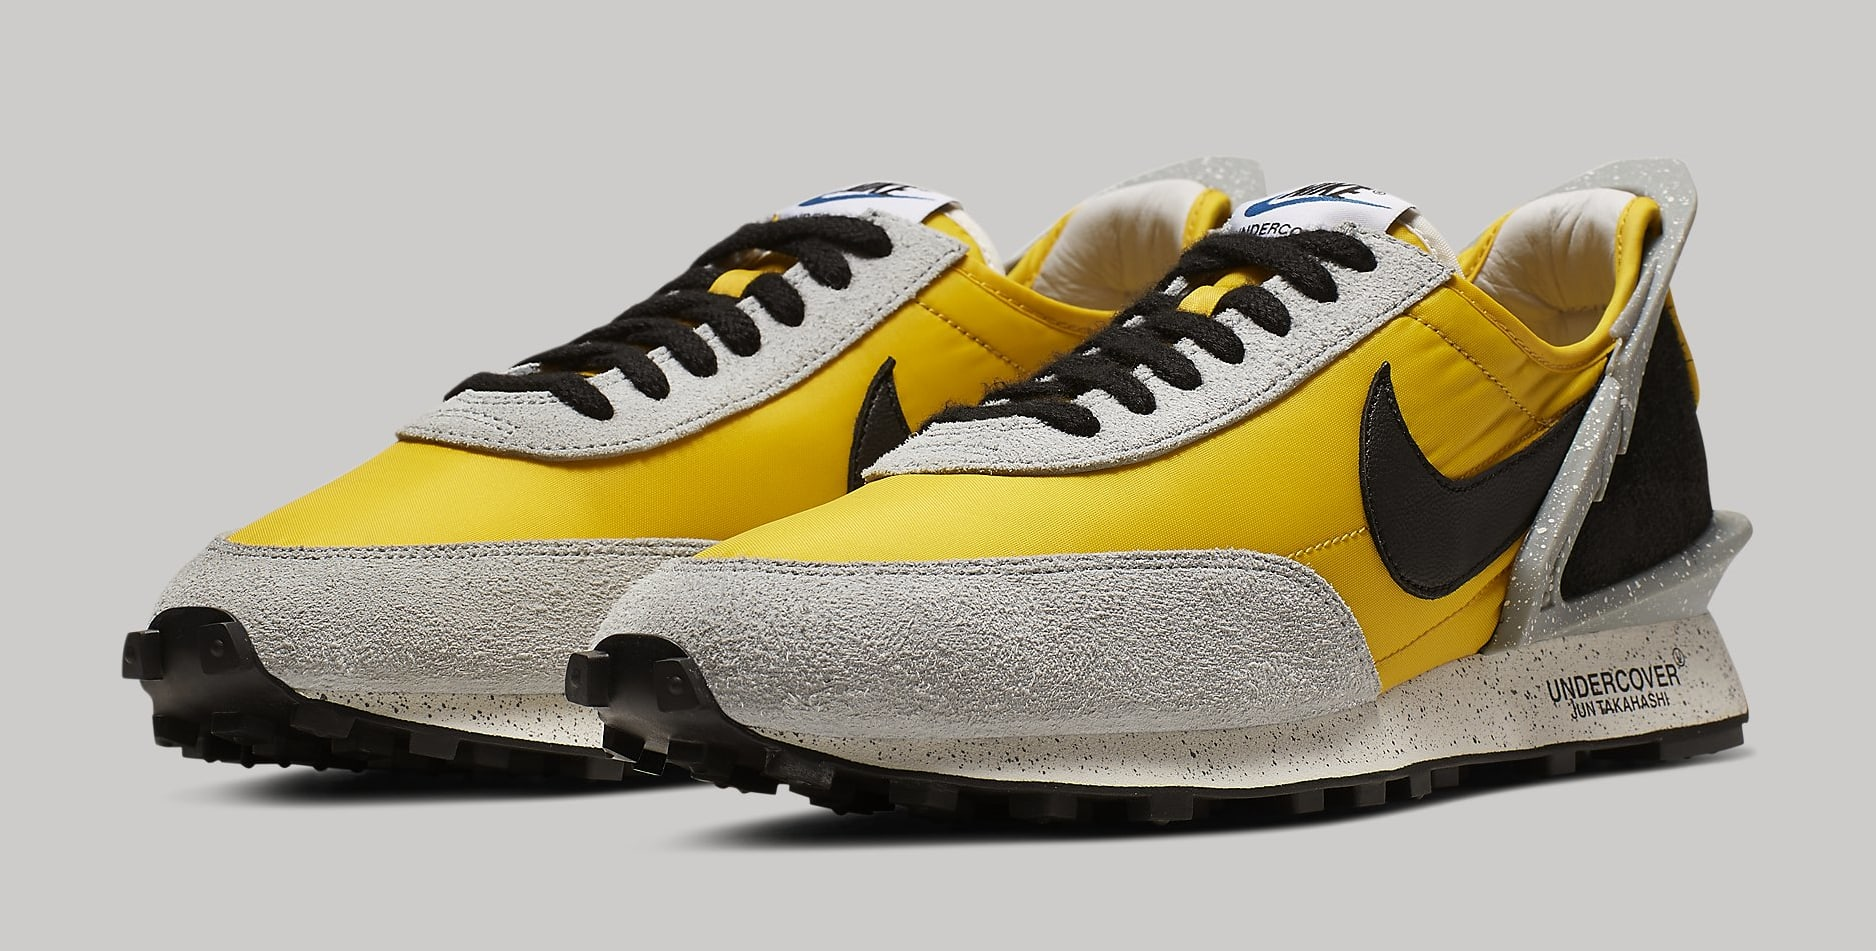 pedazo Cambiable Puno  Undercover x Nike Daybreak 'Bright Citron' BV4594-700 Release Date | Sole  Collector